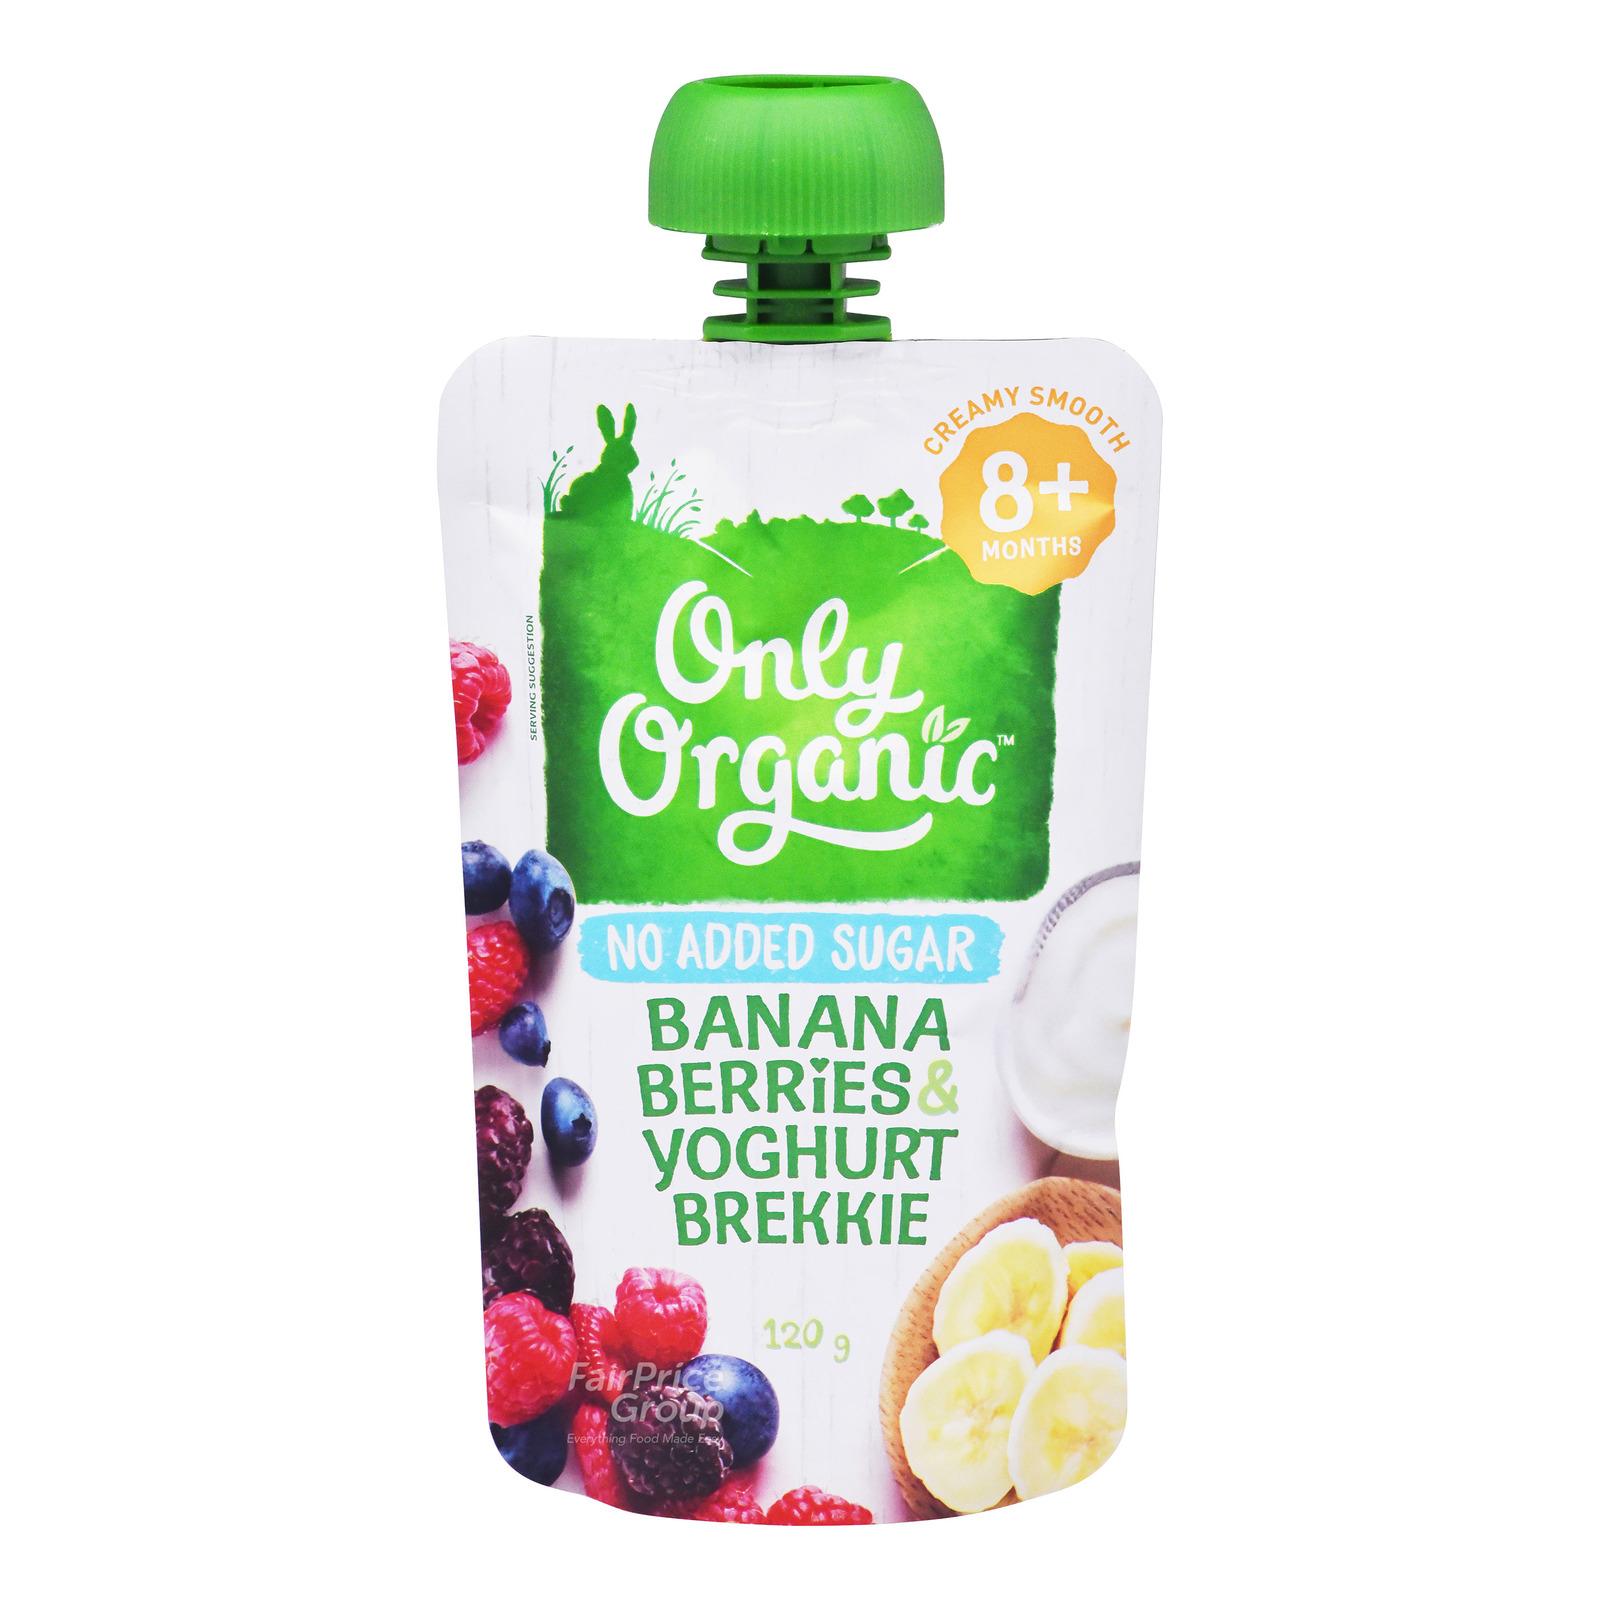 Only Organic 8 Month Brekkie Pouch - Banana Berries & Yoghurt